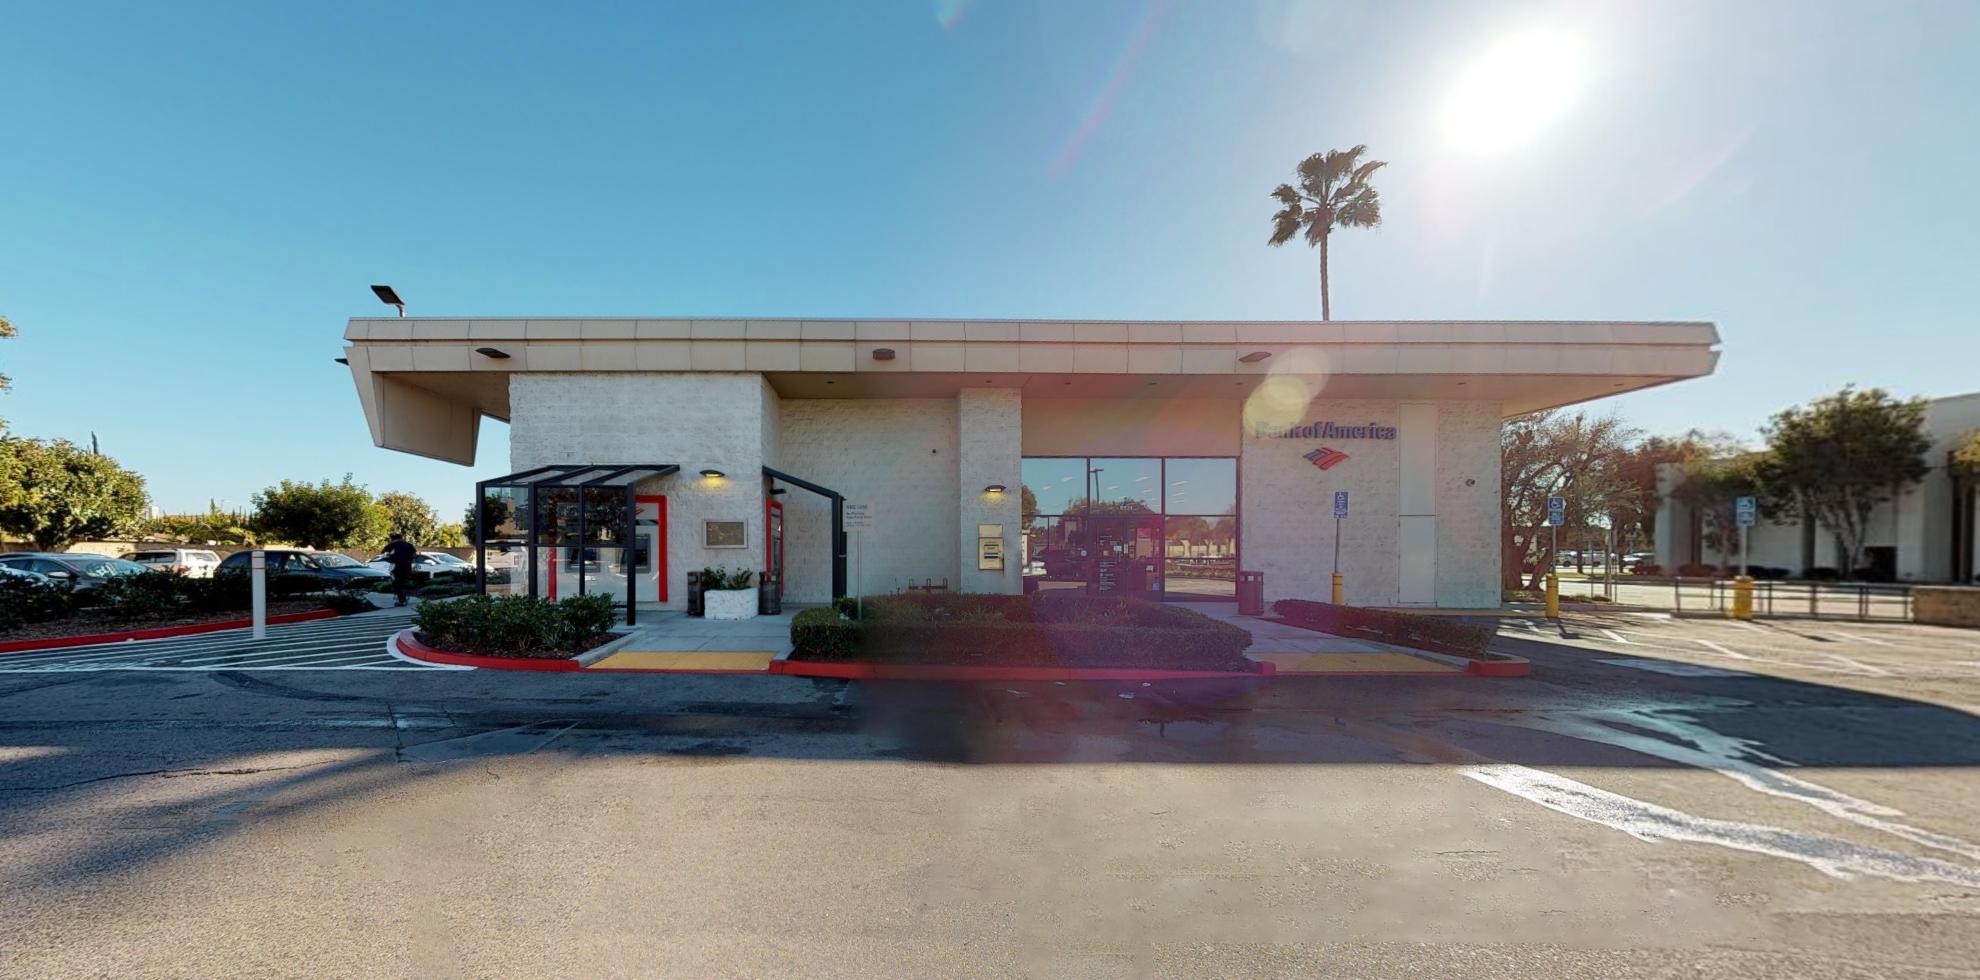 Bank of America financial center with drive-thru ATM   5531 La Palma Ave, La Palma, CA 90623